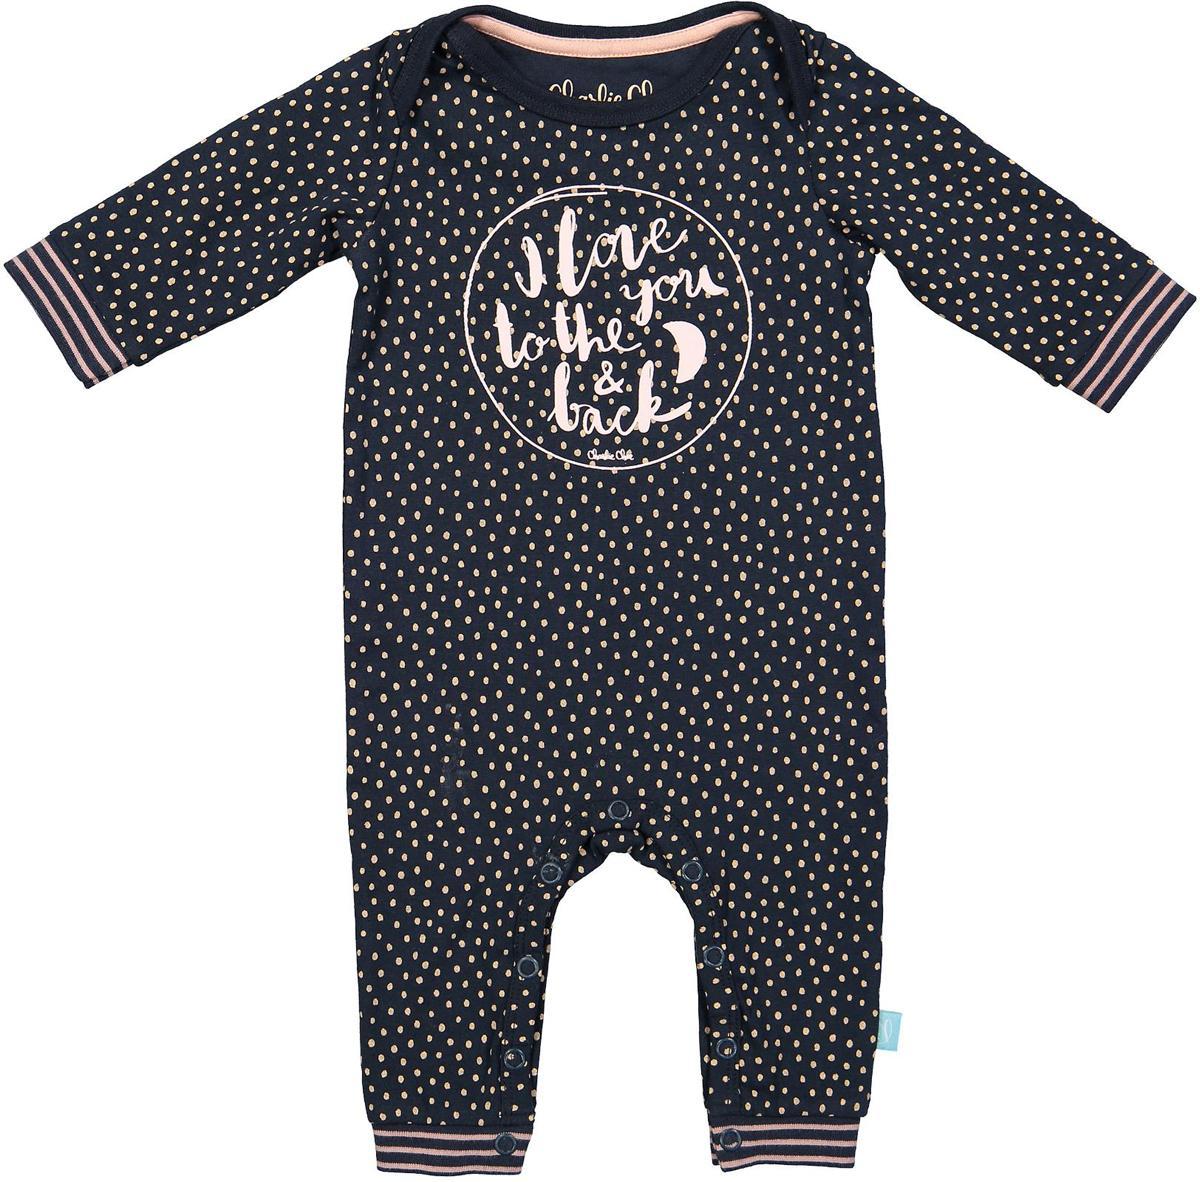 Maat 62 Babykleding.Charlie Choe Pyama Meisje Baby Jumpsuit Forest Dots Blauw Maat 62